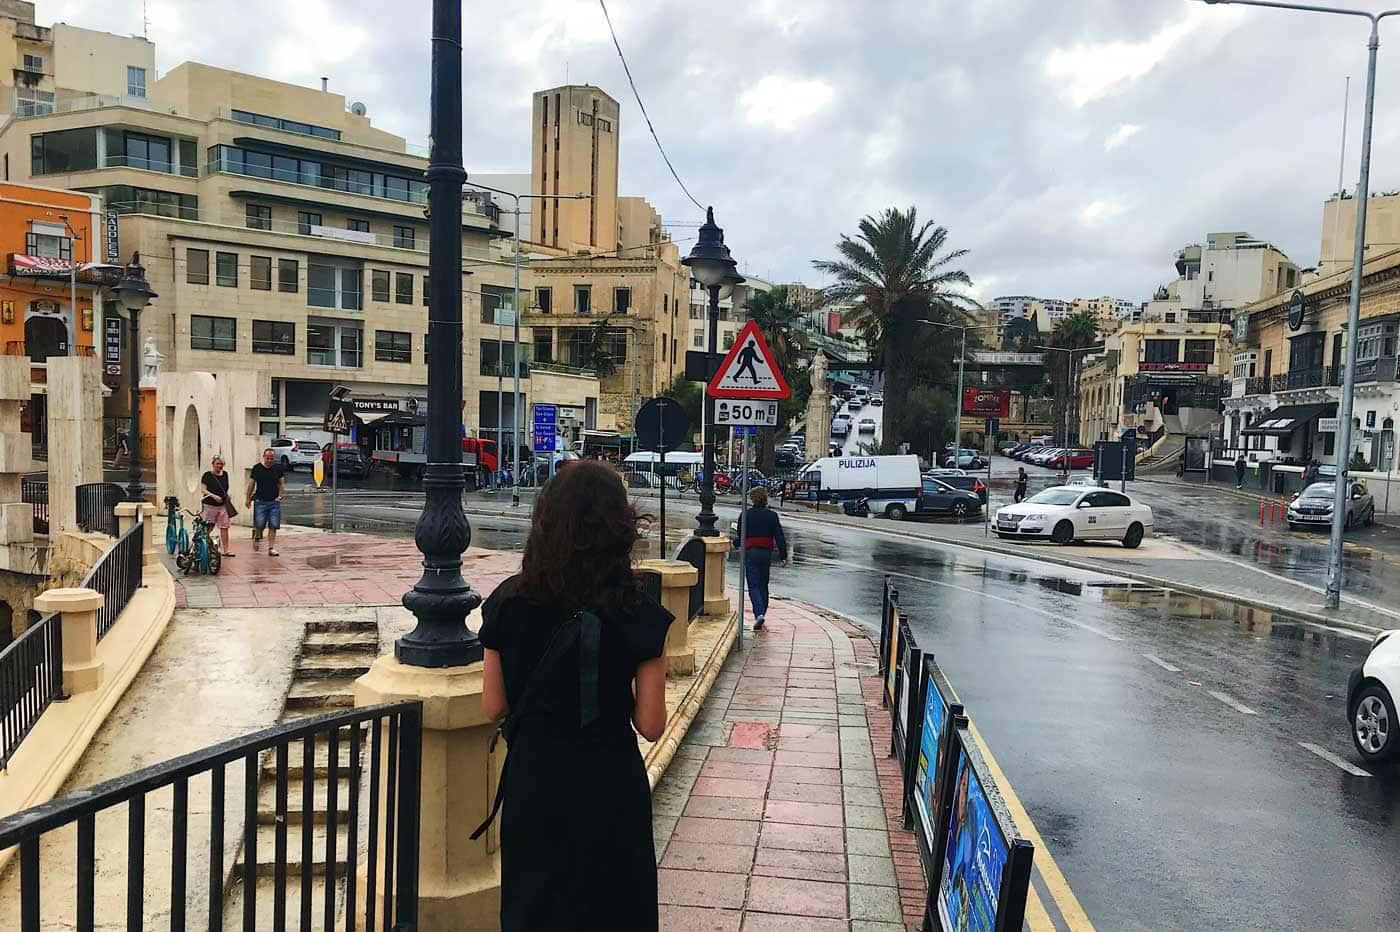 Rainy weather in St Julians